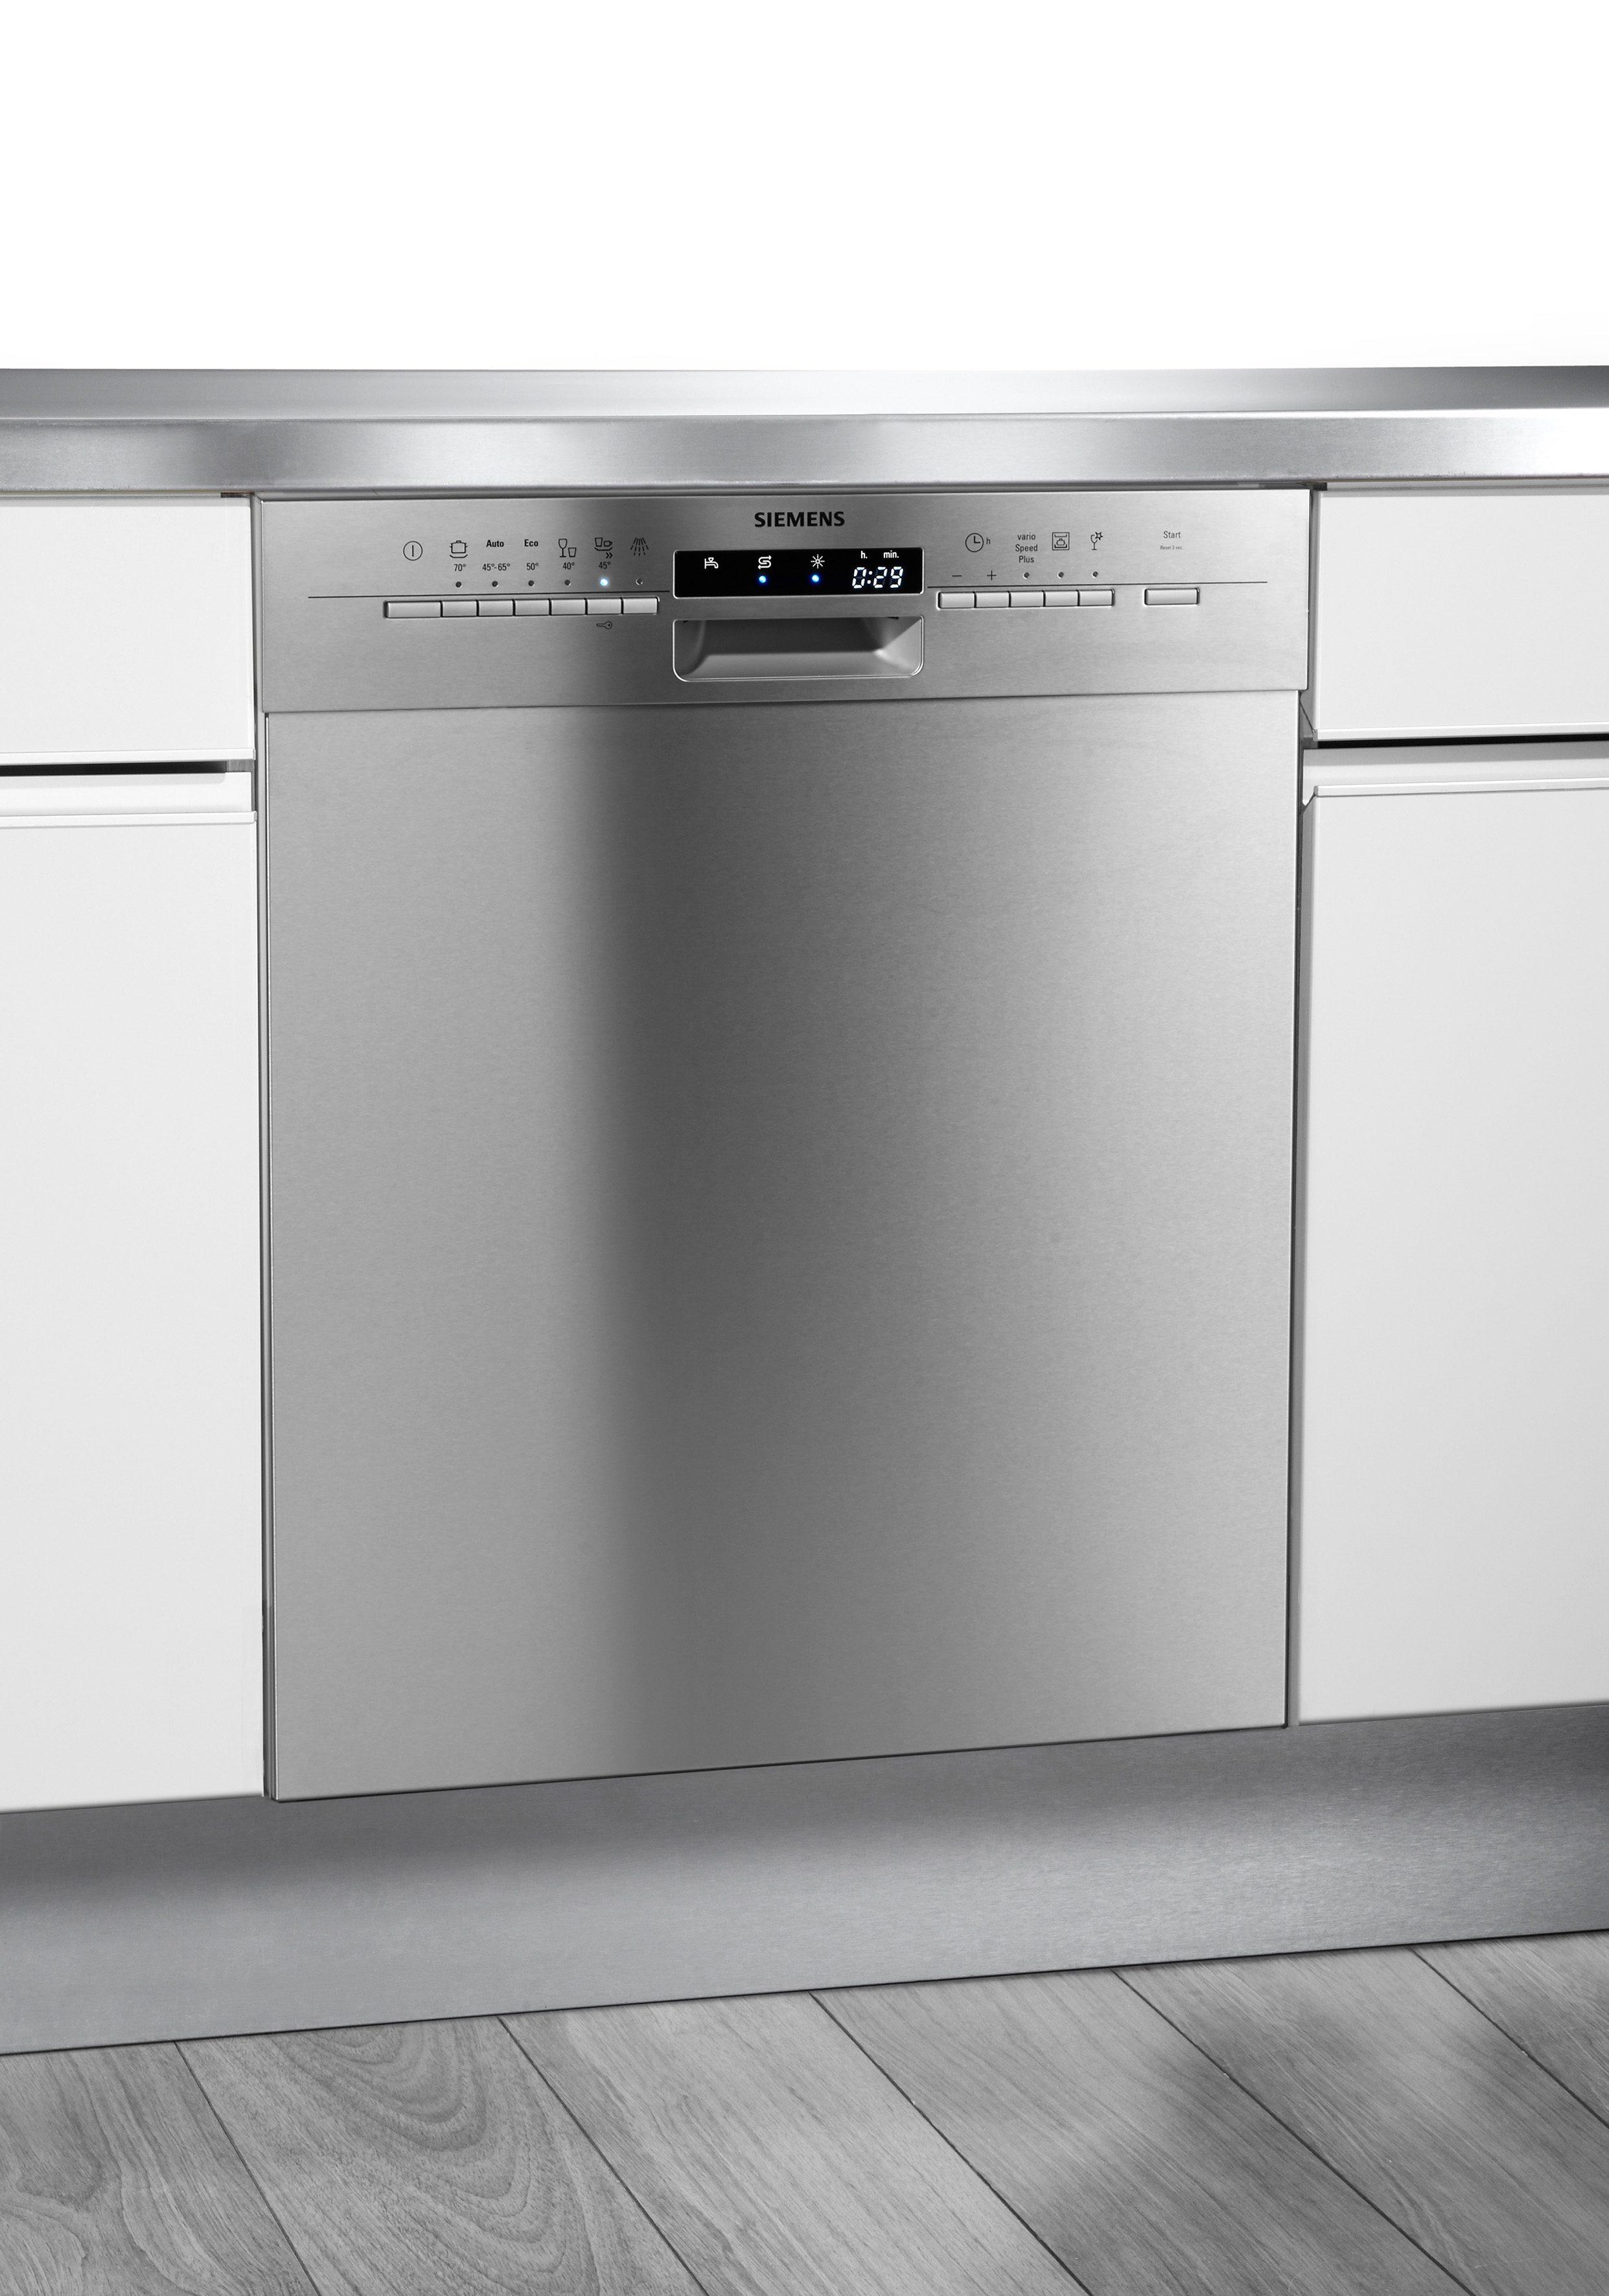 Siemens Unterbau-Geschirrspüler SN46P582EU, A+++, 9,5 Liter, 14 Maßgedecke